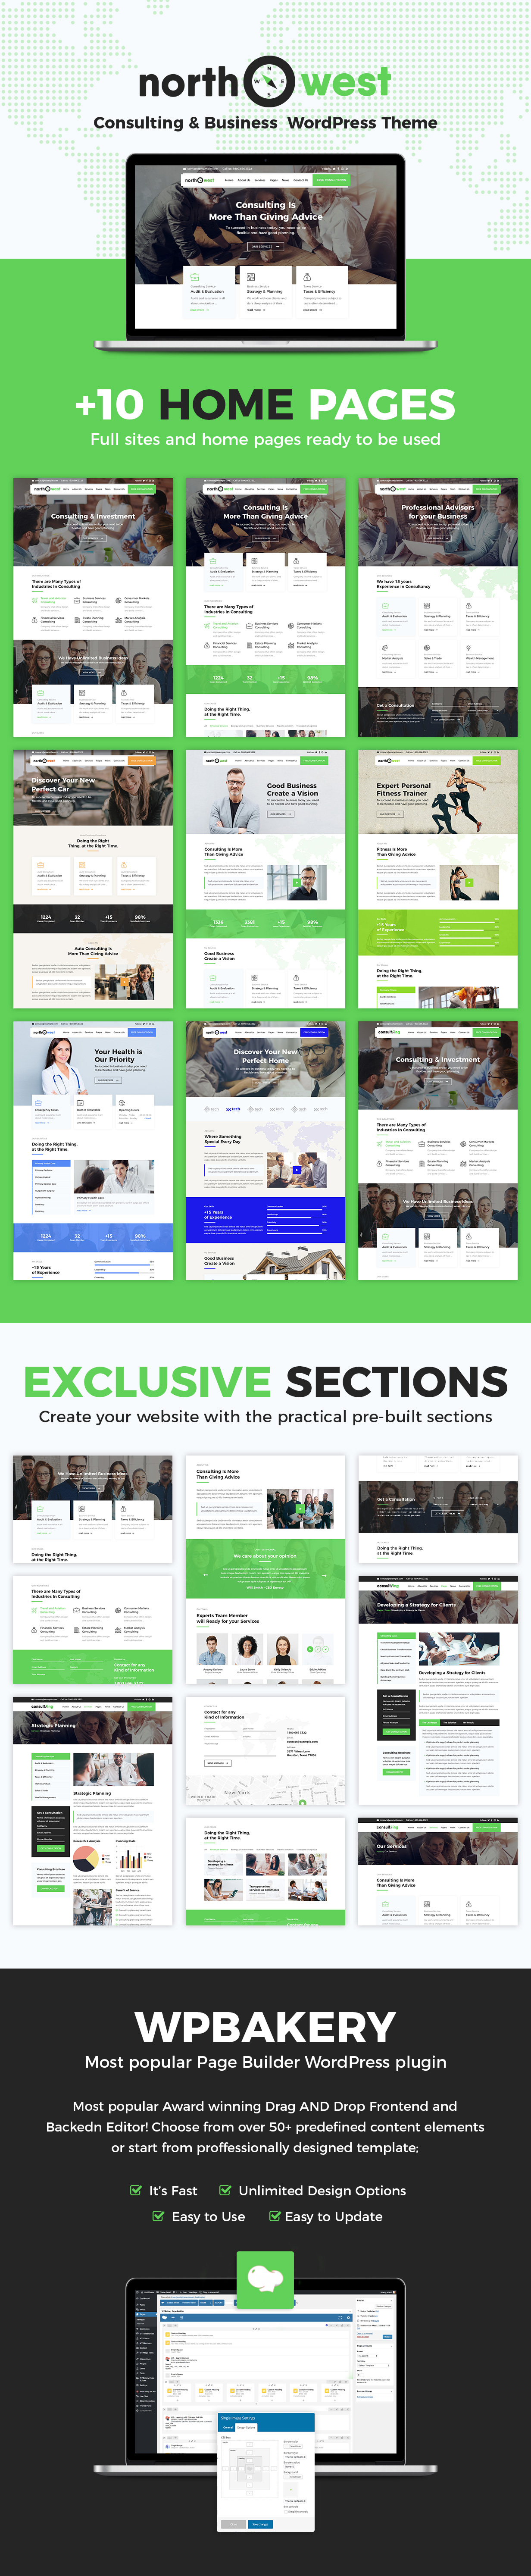 Northwest - Consulting WordPress Theme - 1